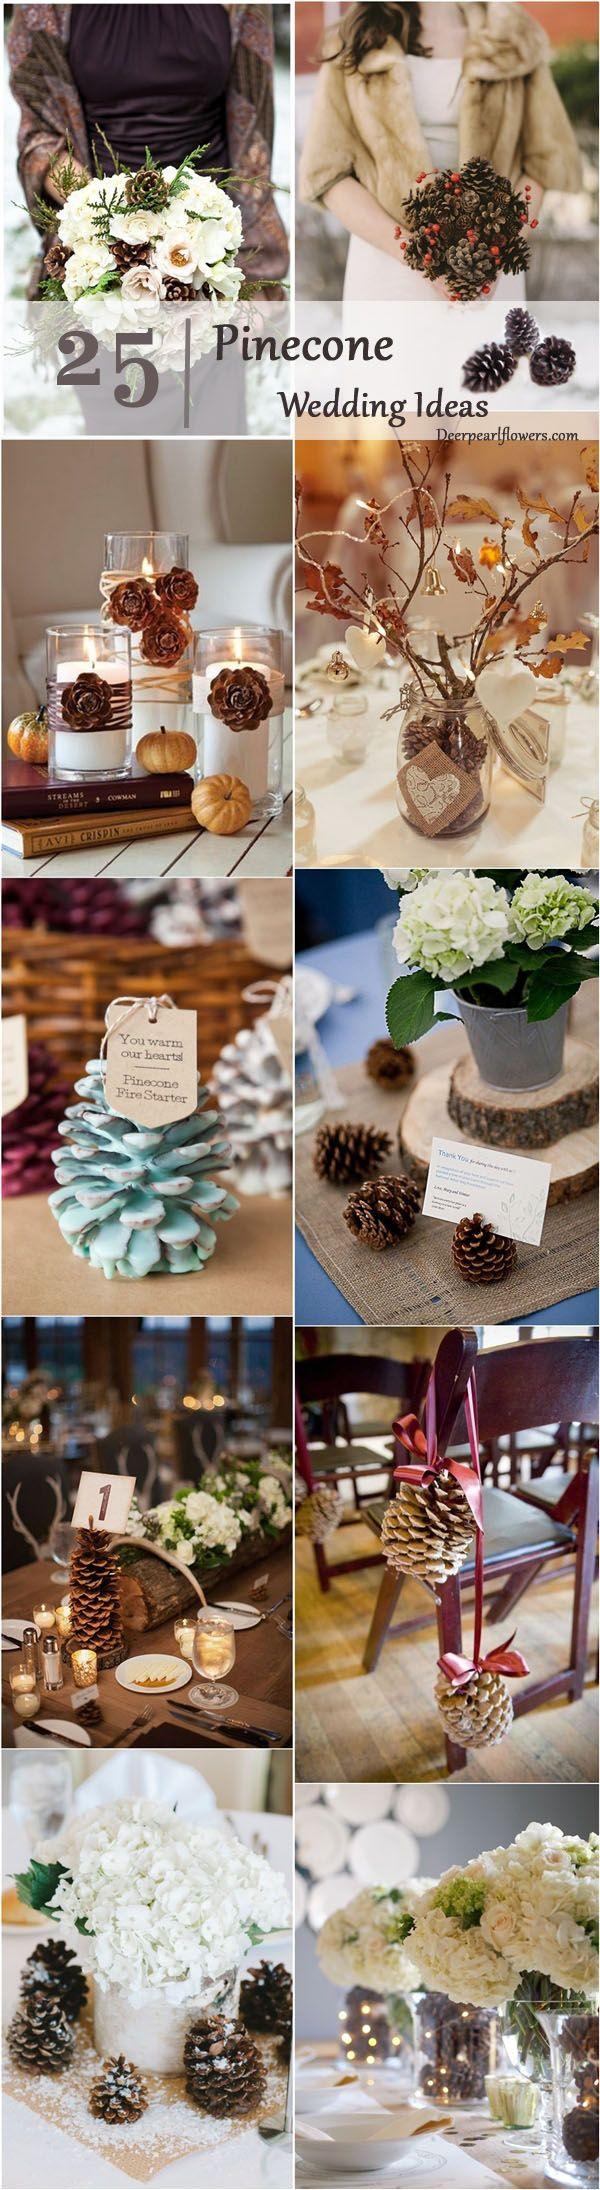 Fall wedding decoration ideas reception  mariage duhiver blanc  white winter wedding  mariage  Pinterest